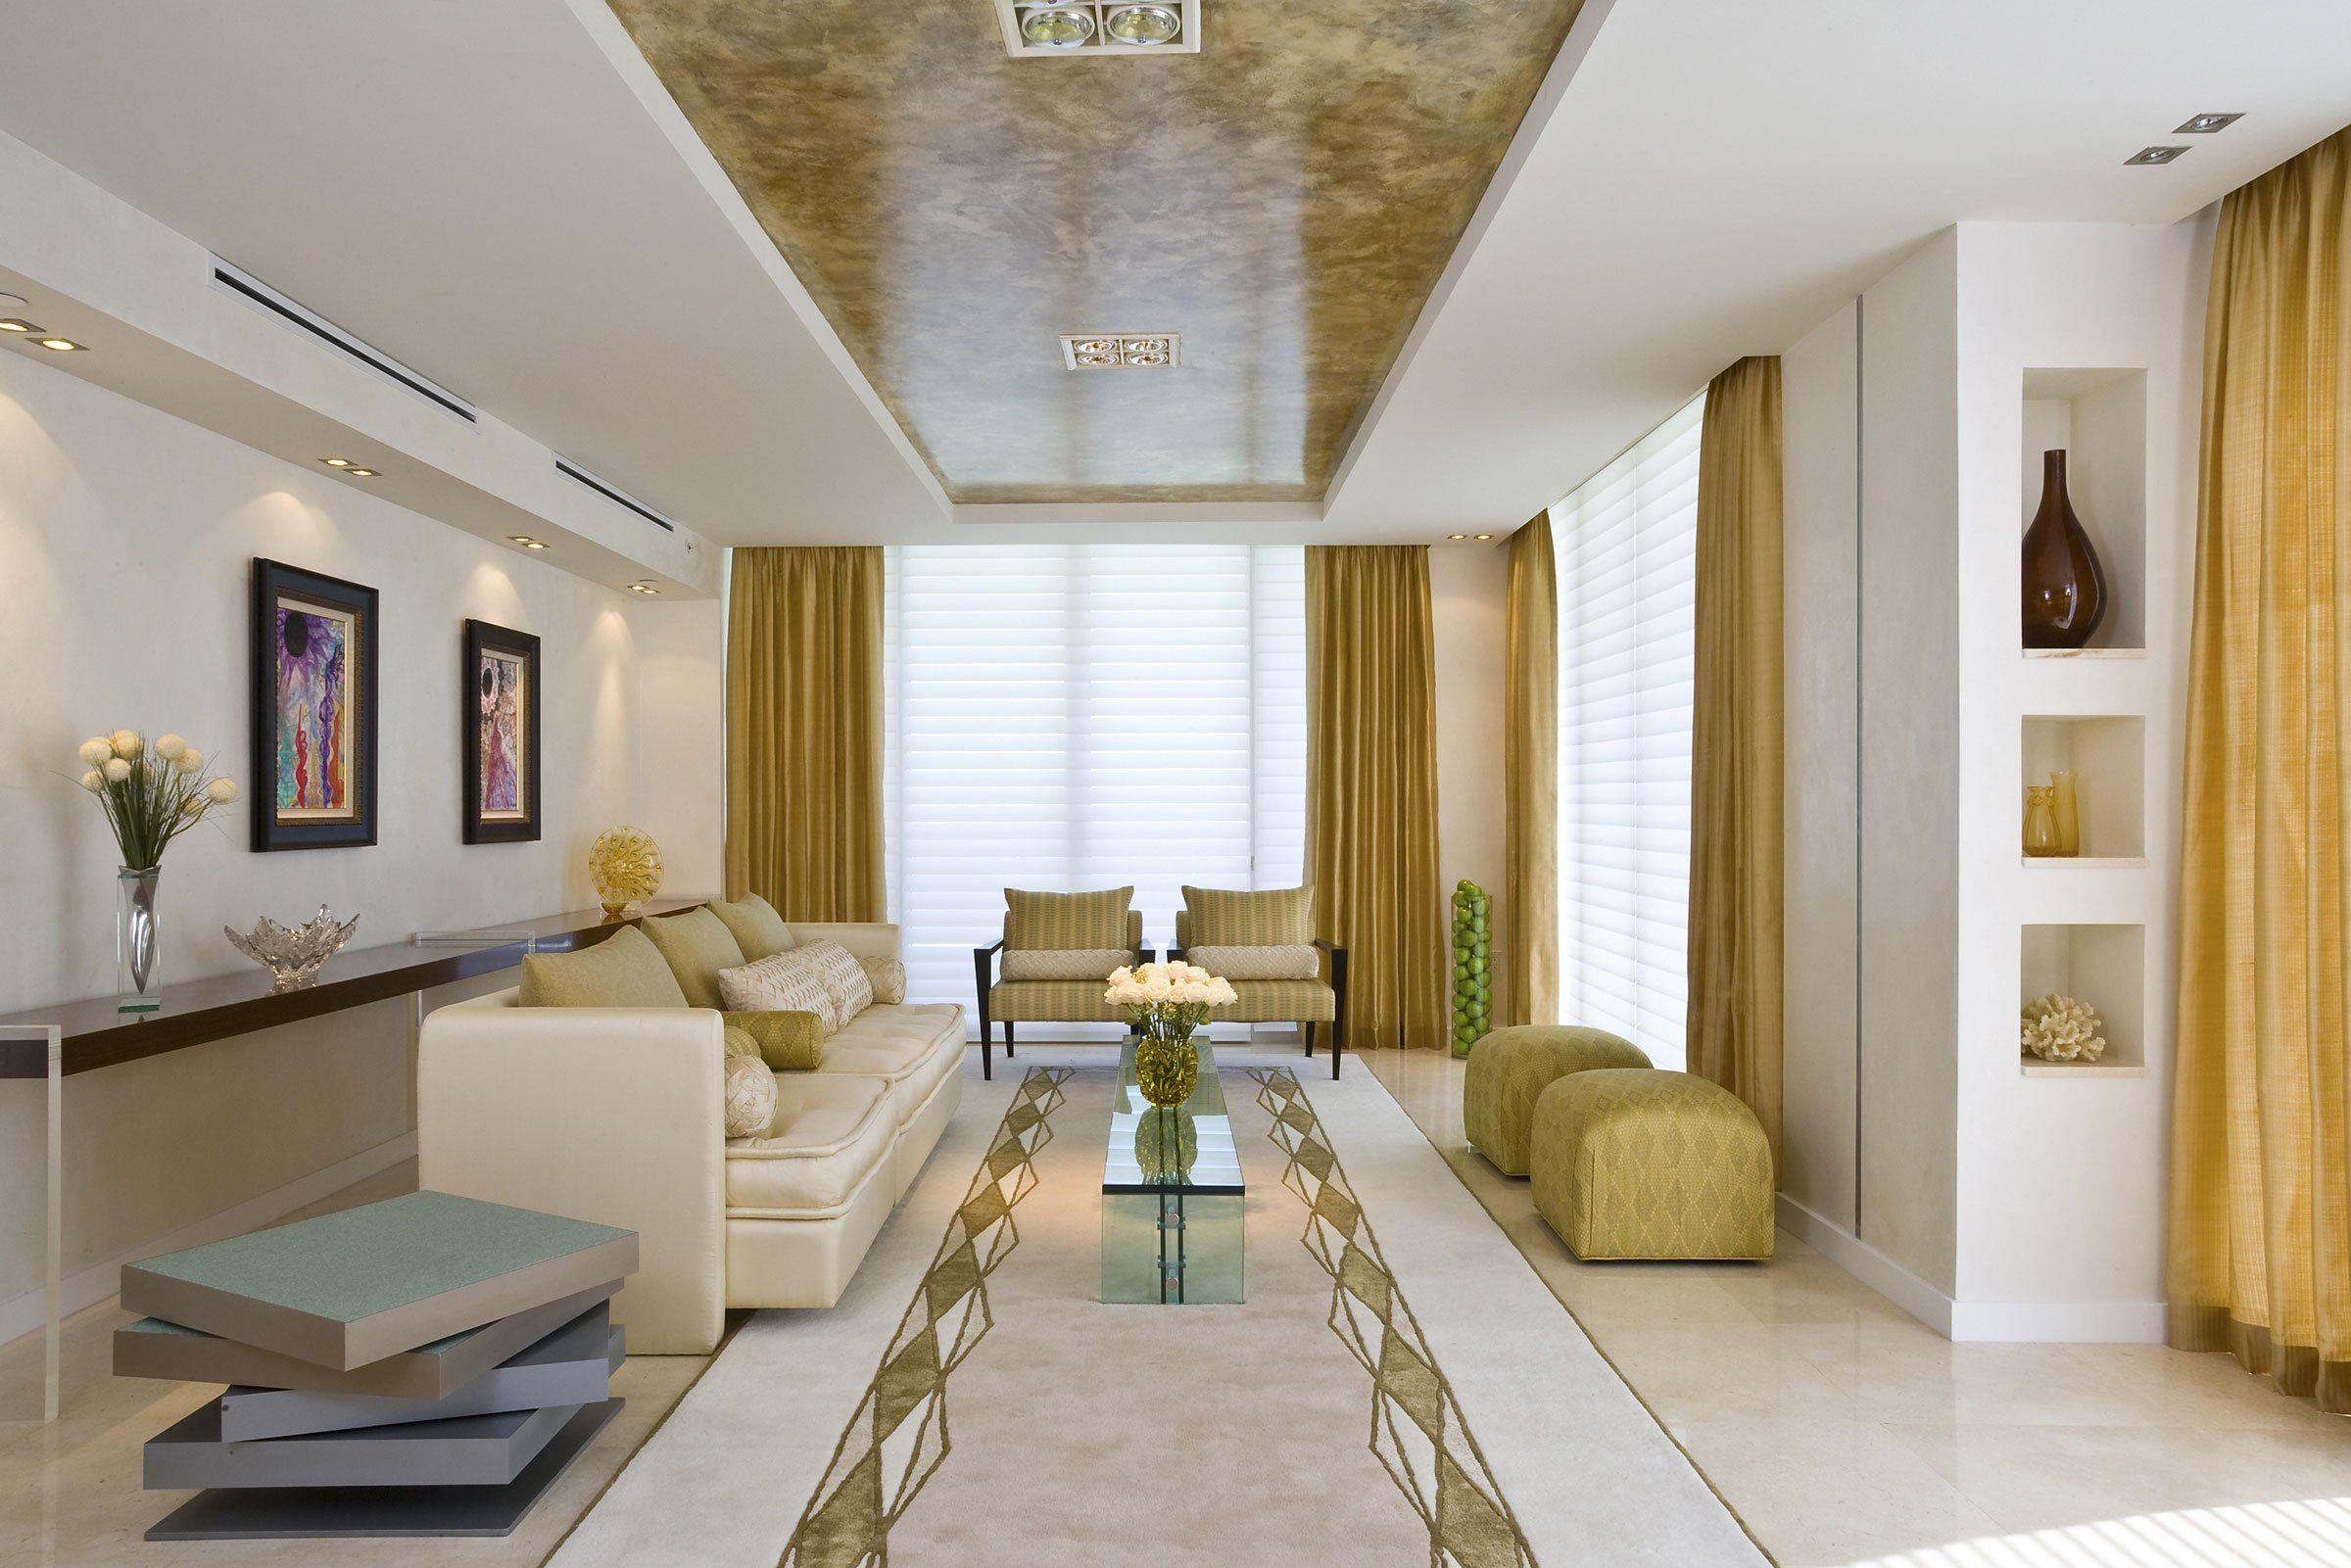 Fesselnd Art Interior Olga Burtseva Home Designs Latest Modern Homes Flooring Designs  Ideas